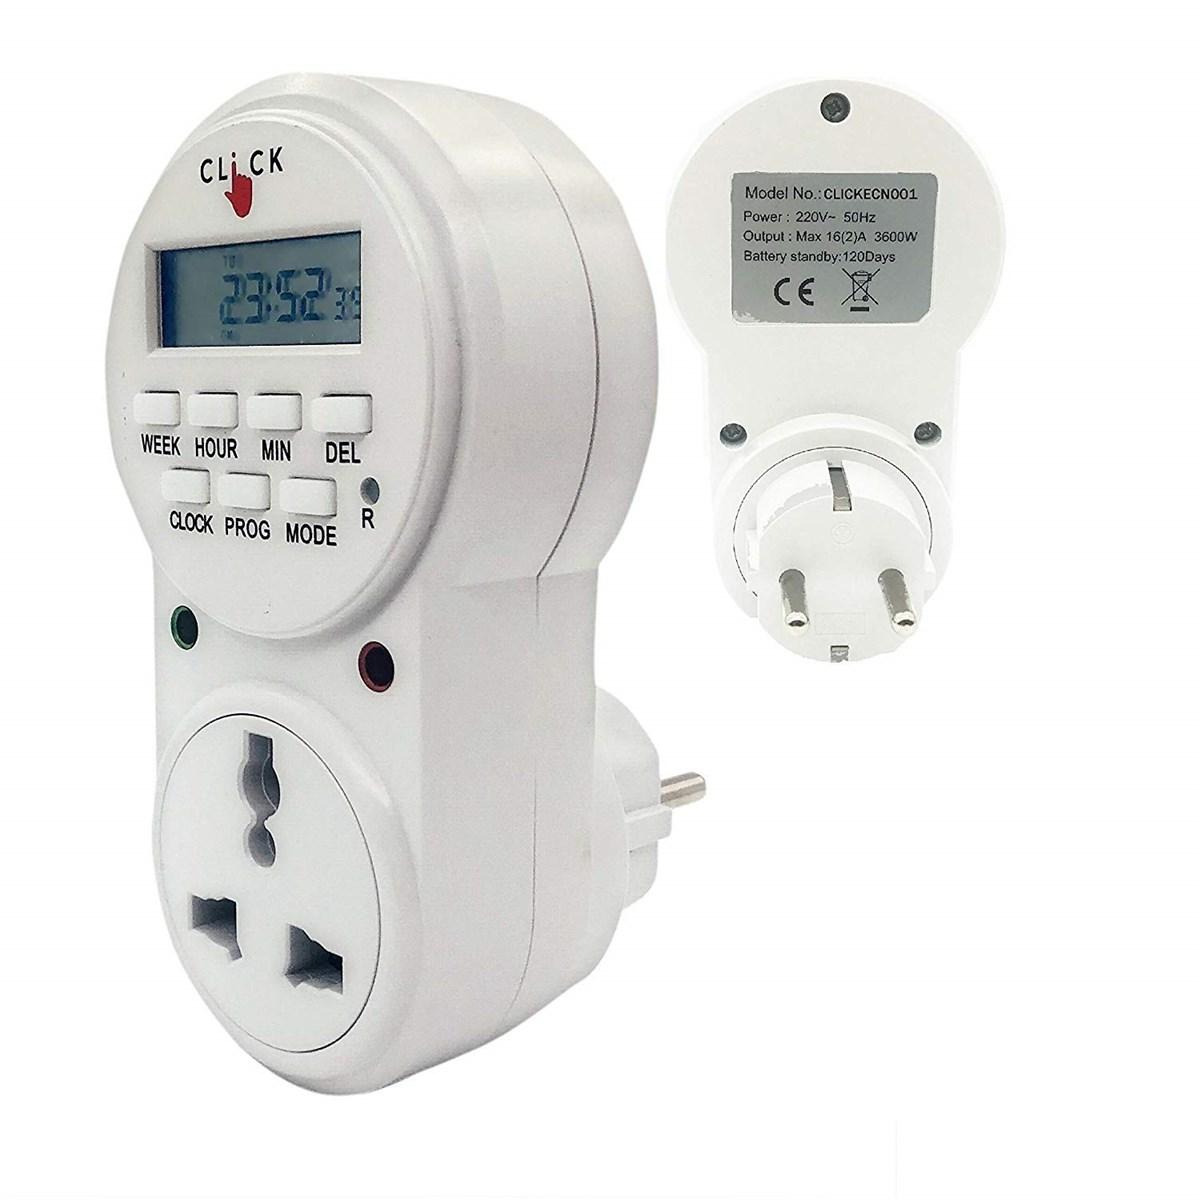 Electrobot Plastic 24x7 Automatic Smart Digital Programmable Timer Switch with Smart Socket Plug